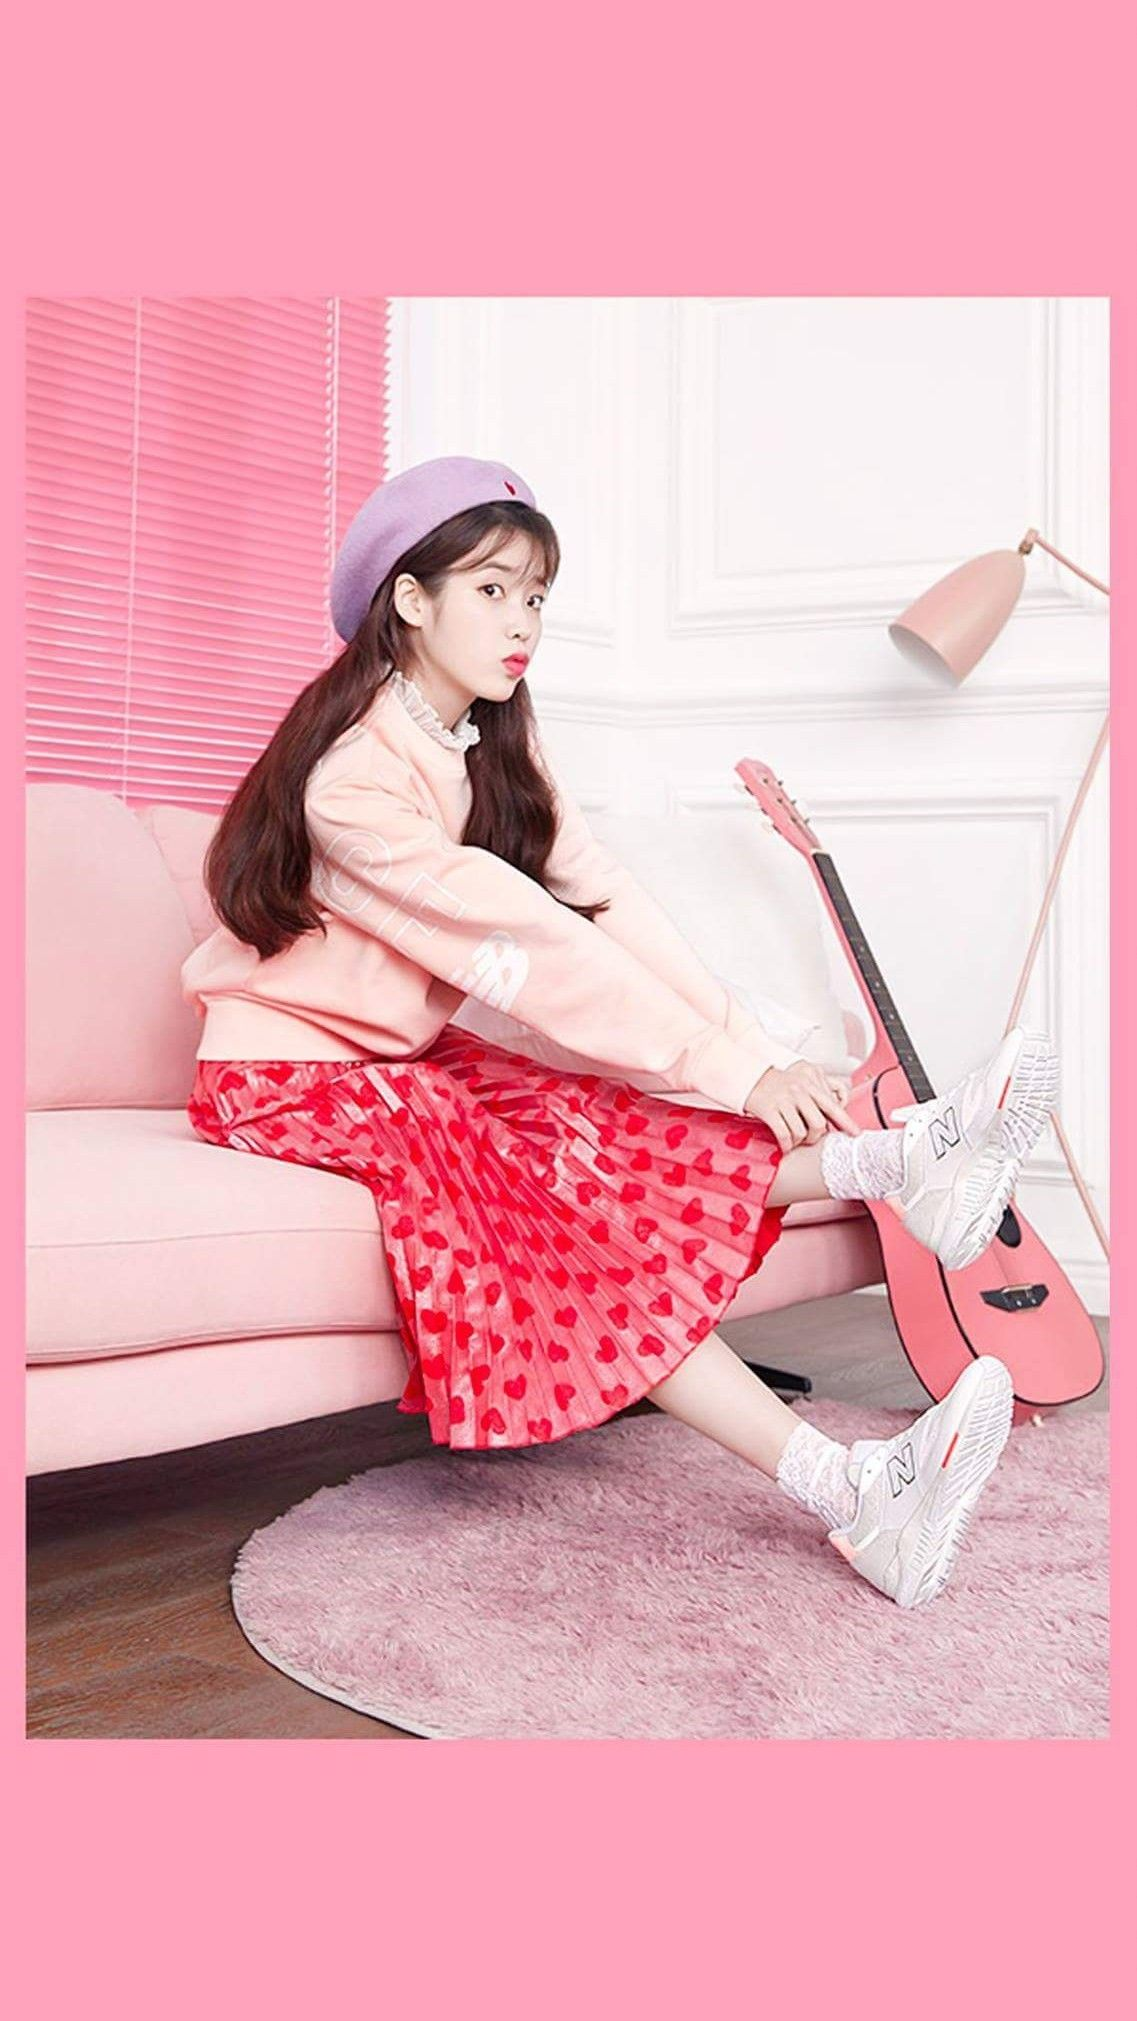 IU wallpaper newbalance 한국 스타일, 아시아 패션, 뉴발란스